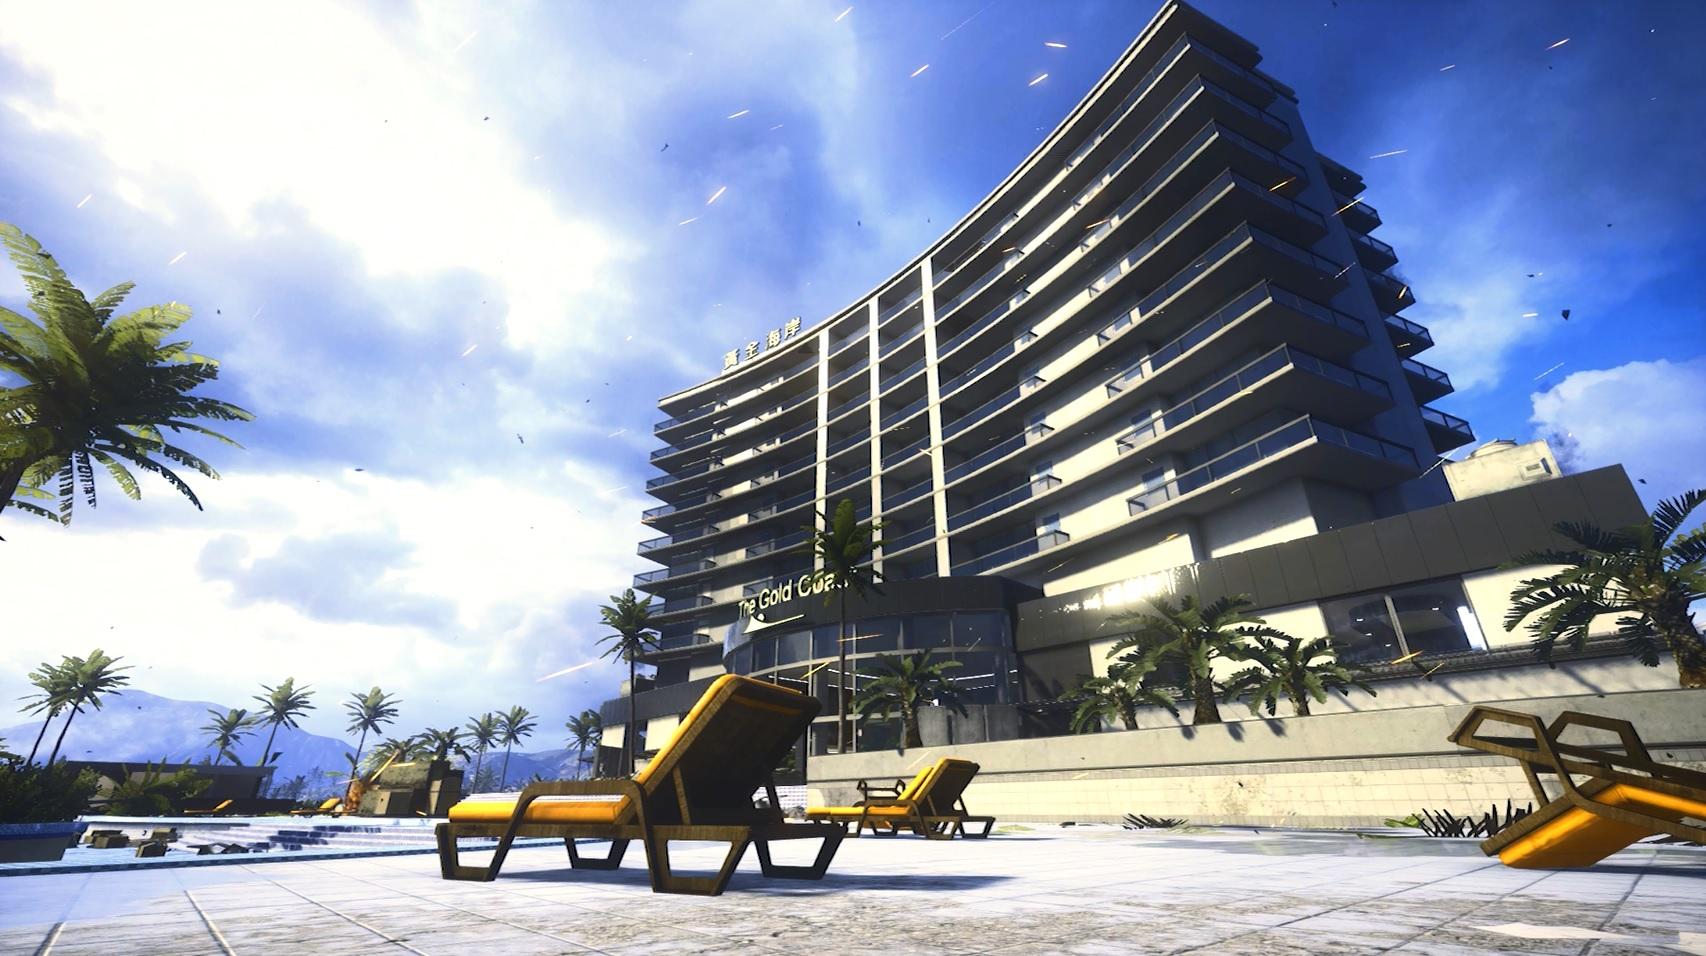 File:Hainan Resort.jpg